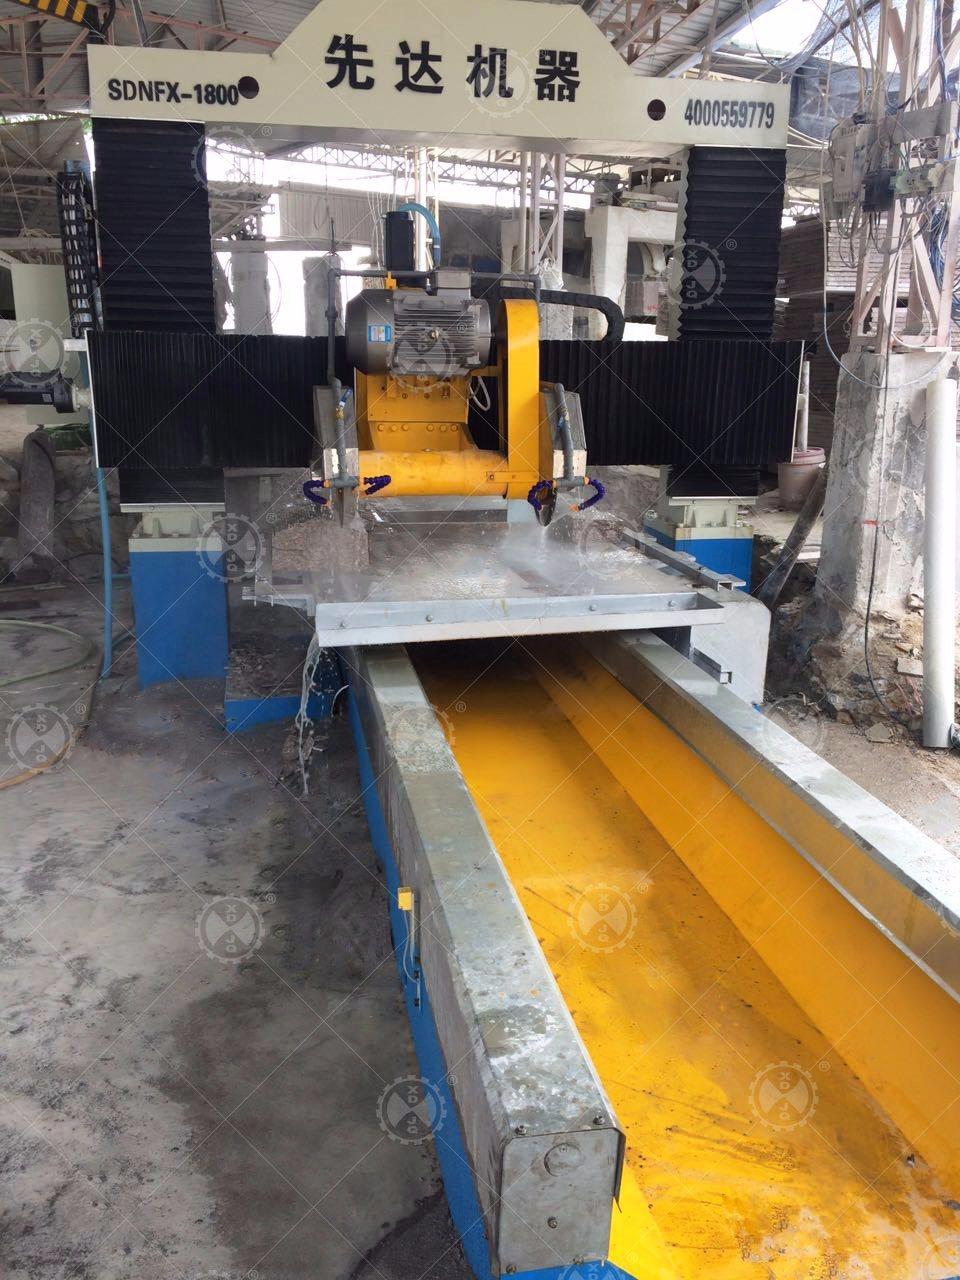 Sdnfx-1800 Gantry Lifting Type Stone Profile Cutting Machine